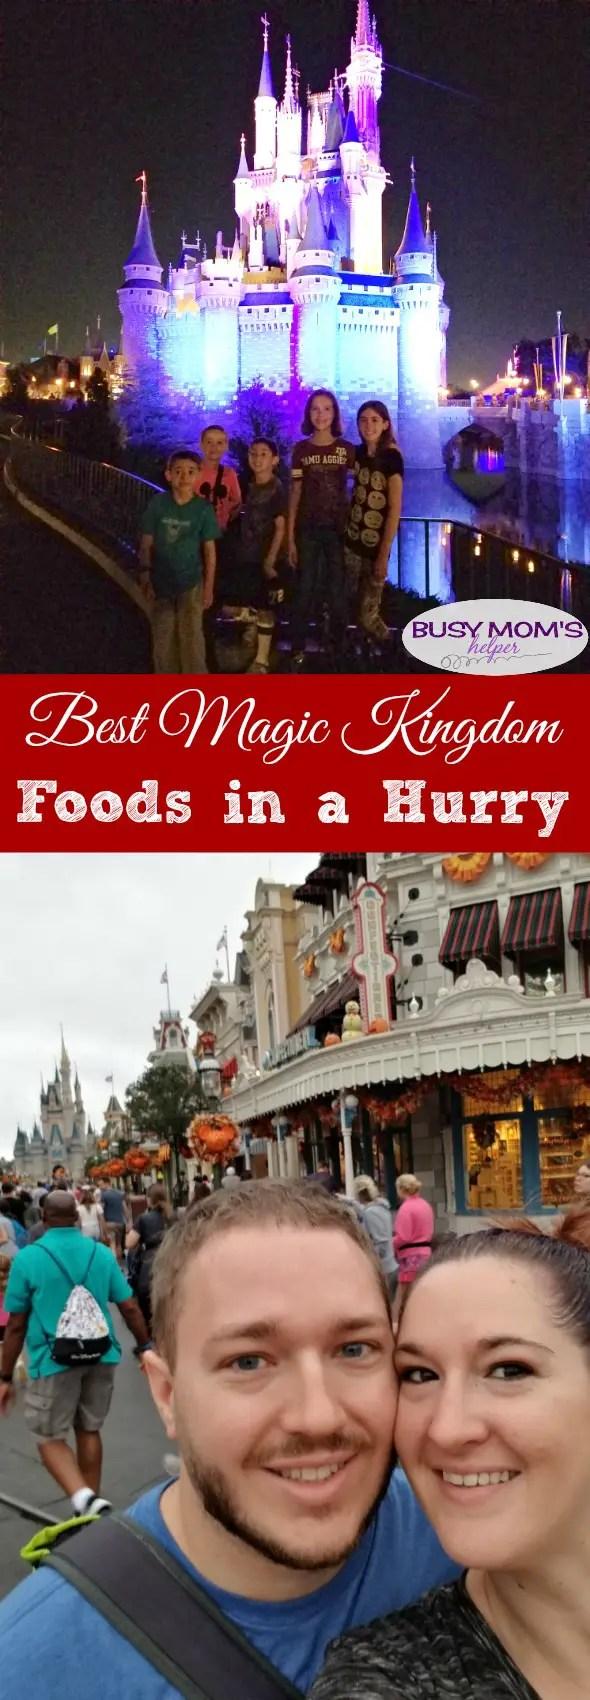 Best Magic Kingdom Foods in a Hurry #waltdisneyworld #familytravel #travel #disney #magickingdom